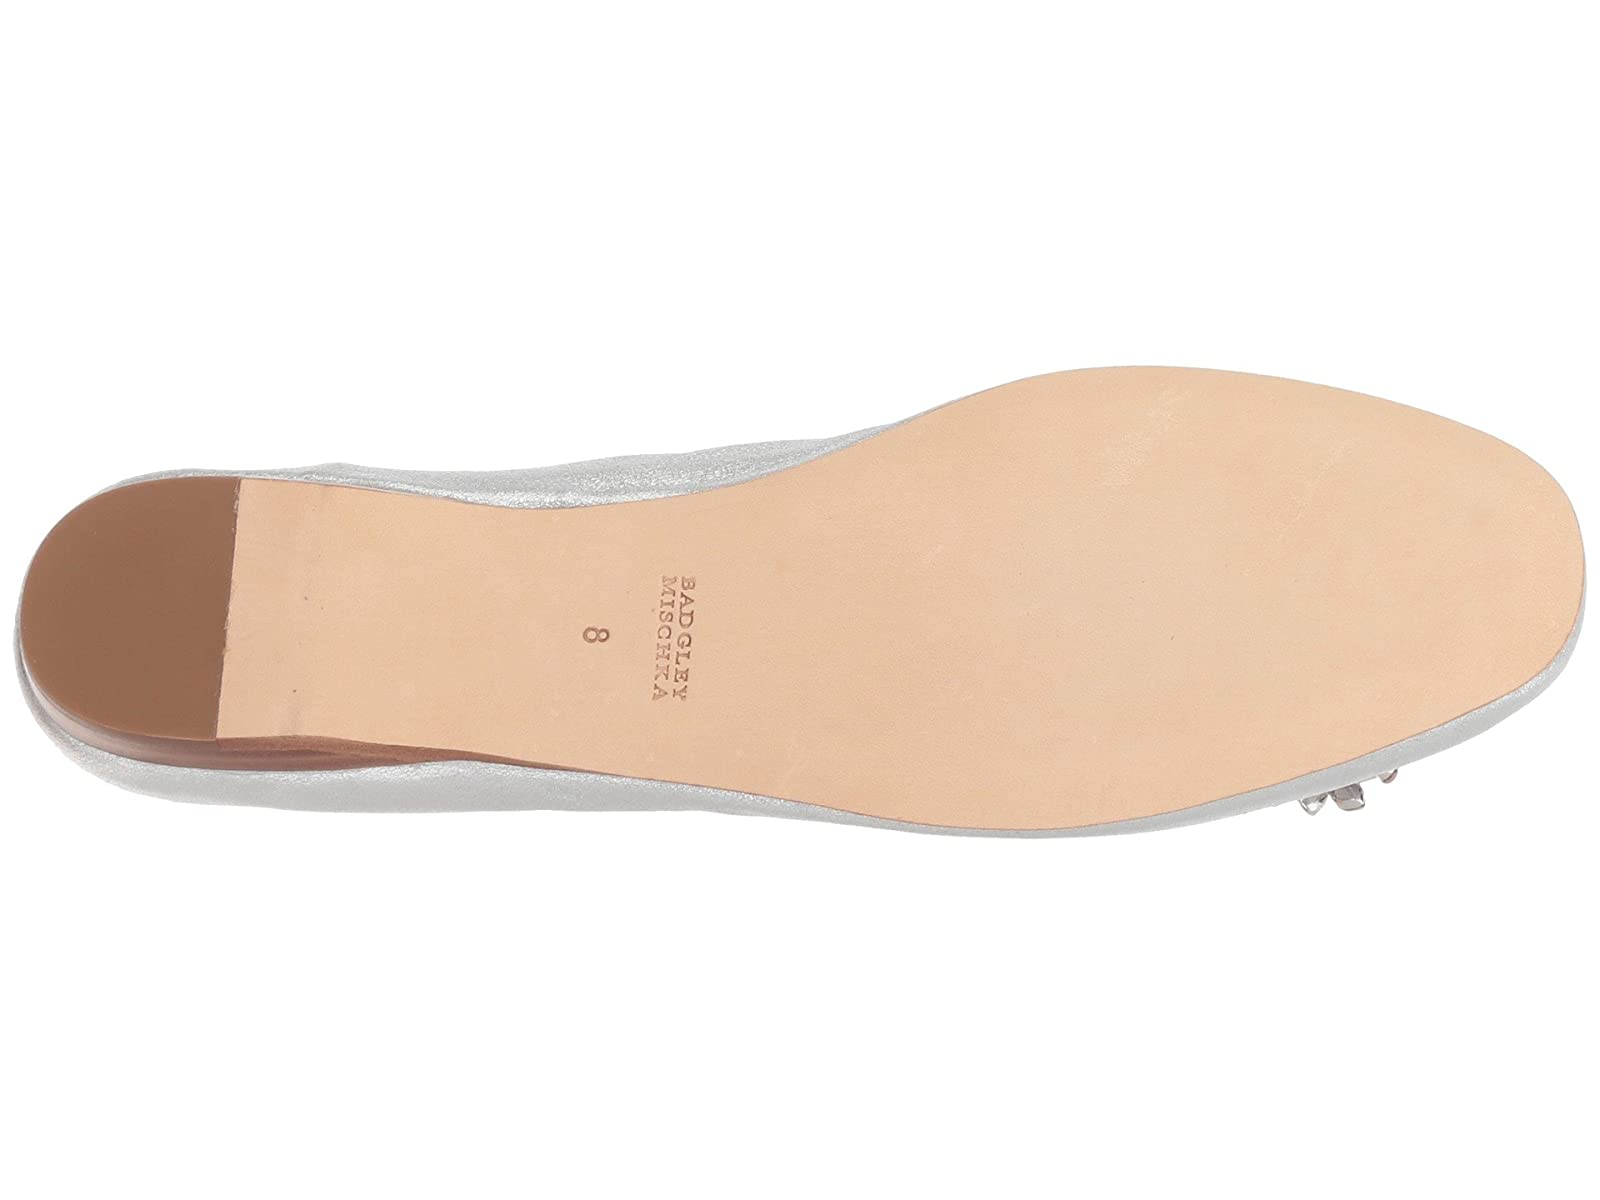 Gentlemen/Ladies Man's/Woman's Badgley Mischka Pippa Low price price price processing  Beautiful in Color 6e50e8